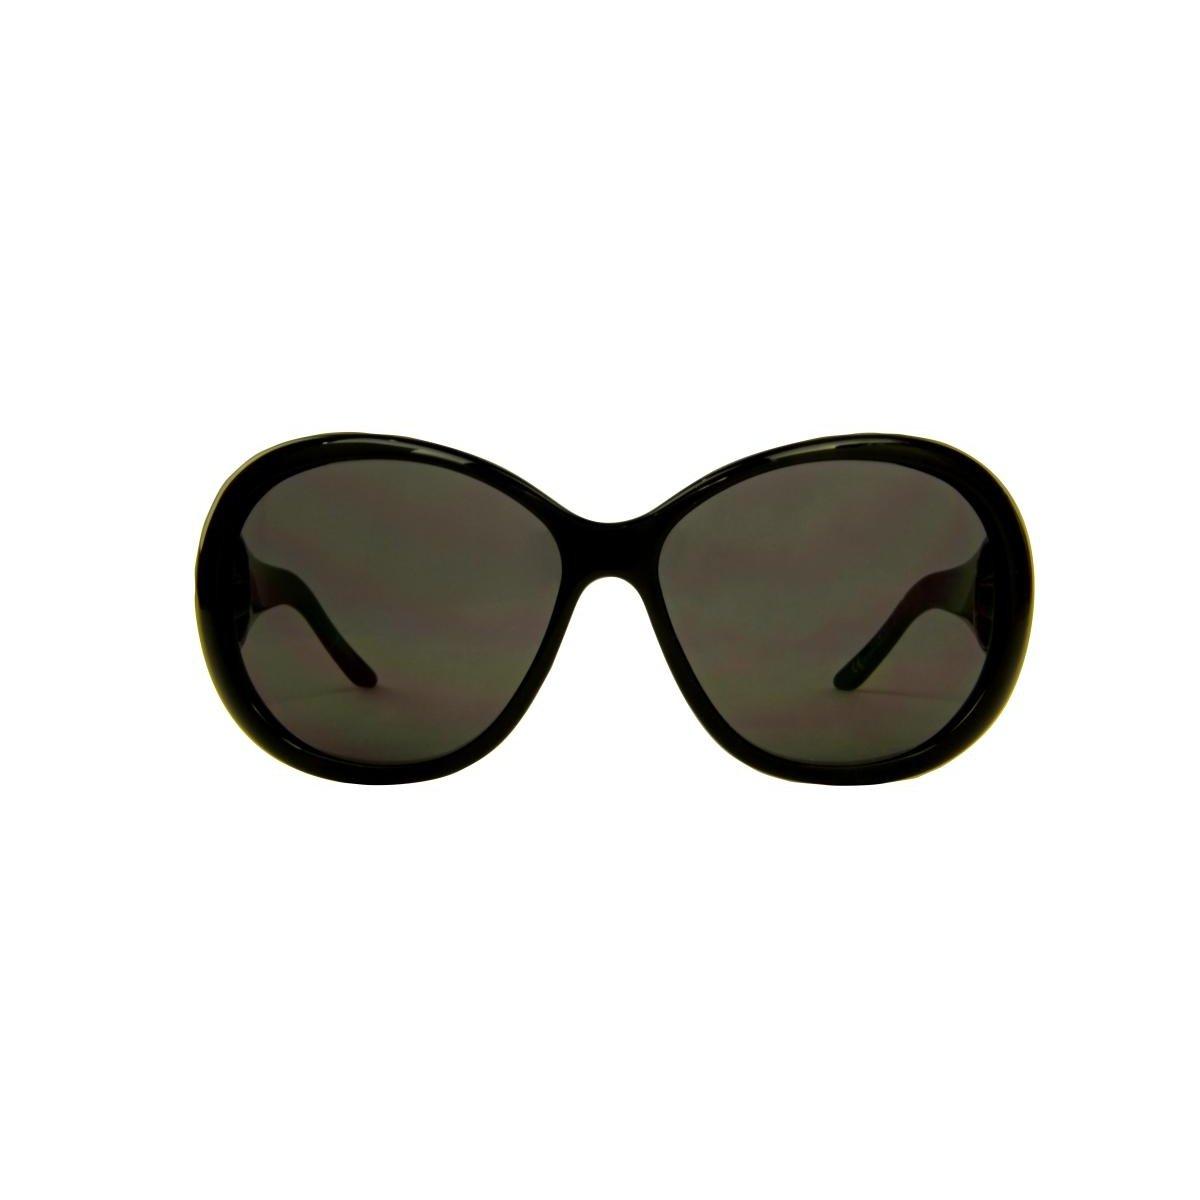 Óculos de Sol Valentino 100% Proteção UV Óptica Melani Feminino ... 3ec5fad349